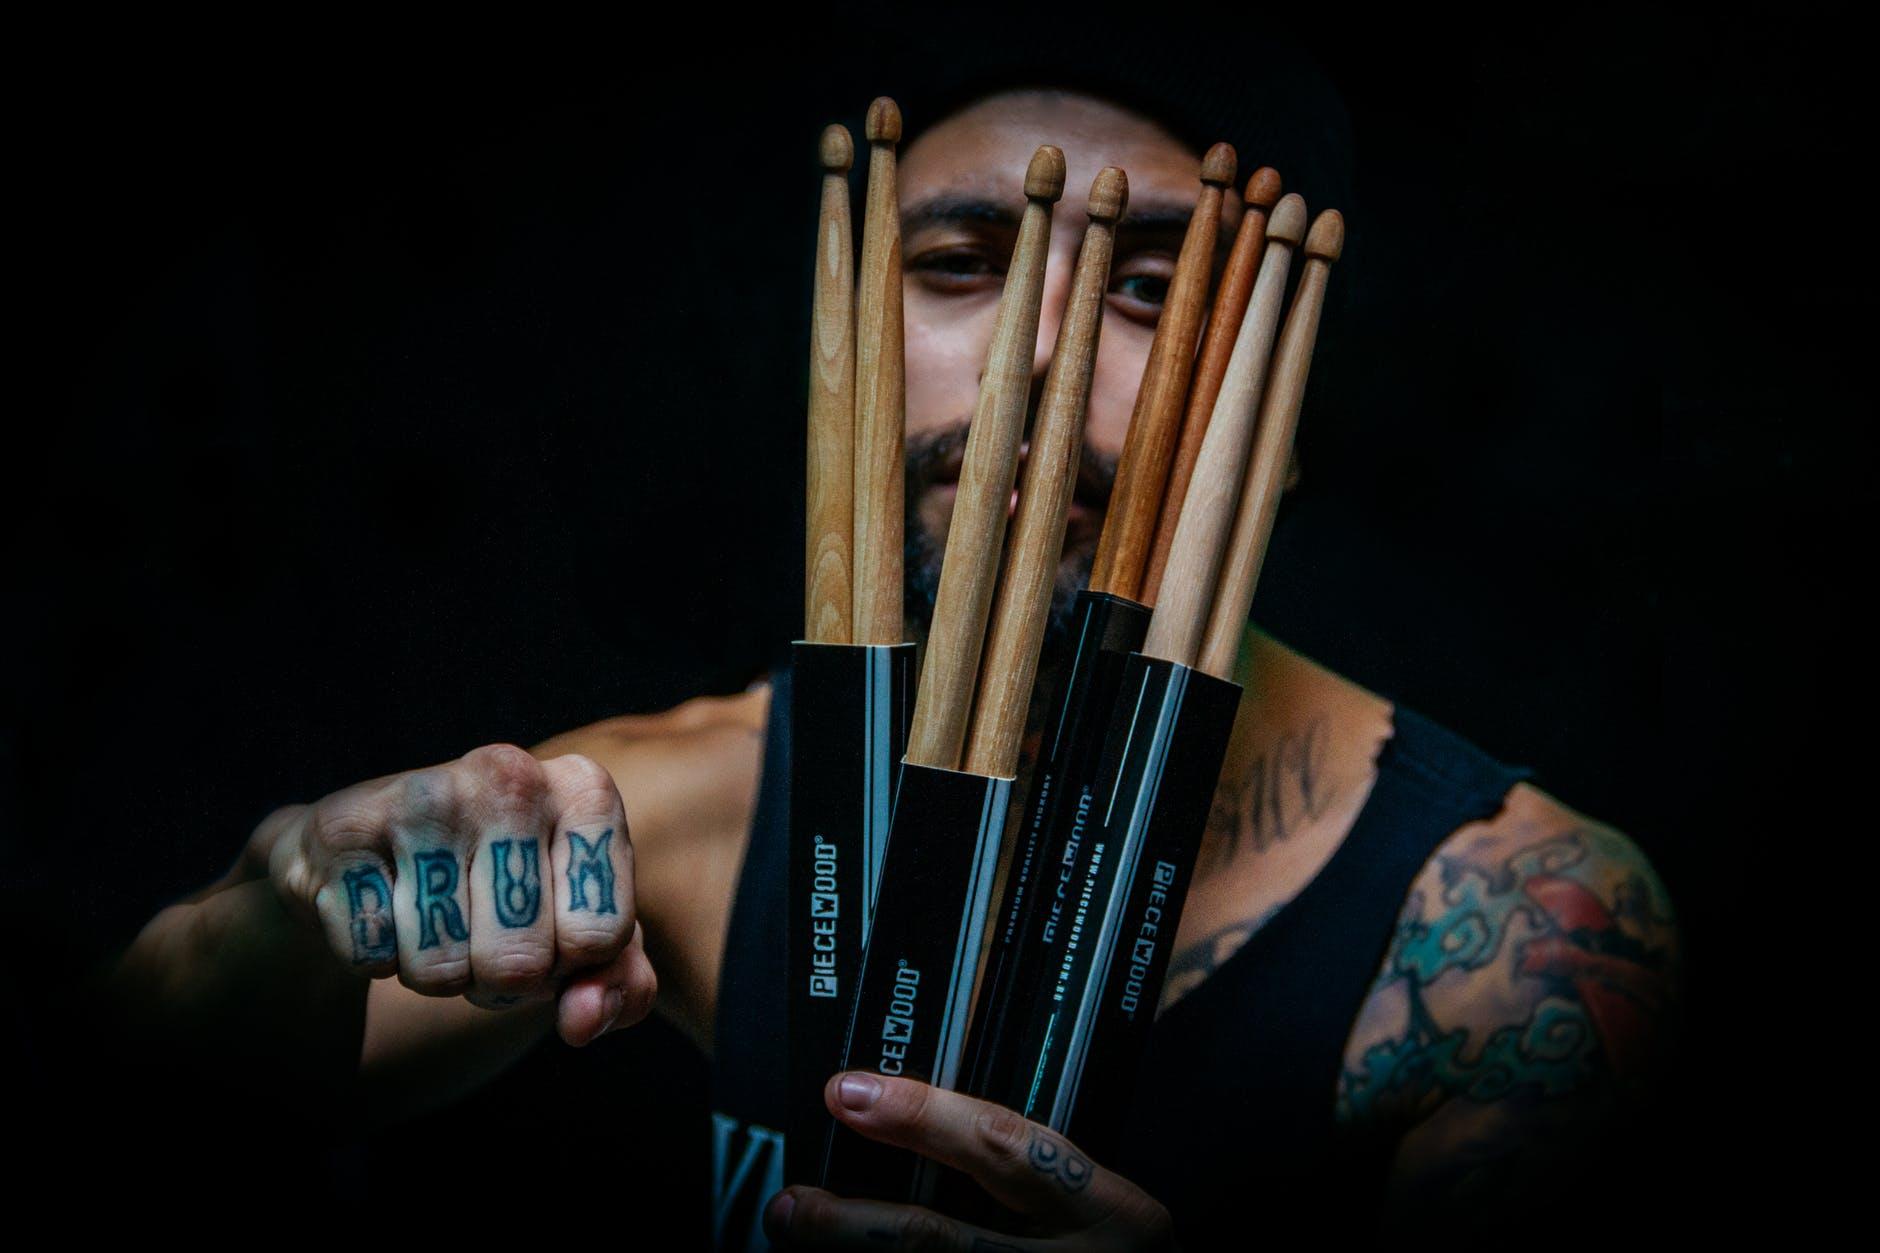 man holding drum sticks